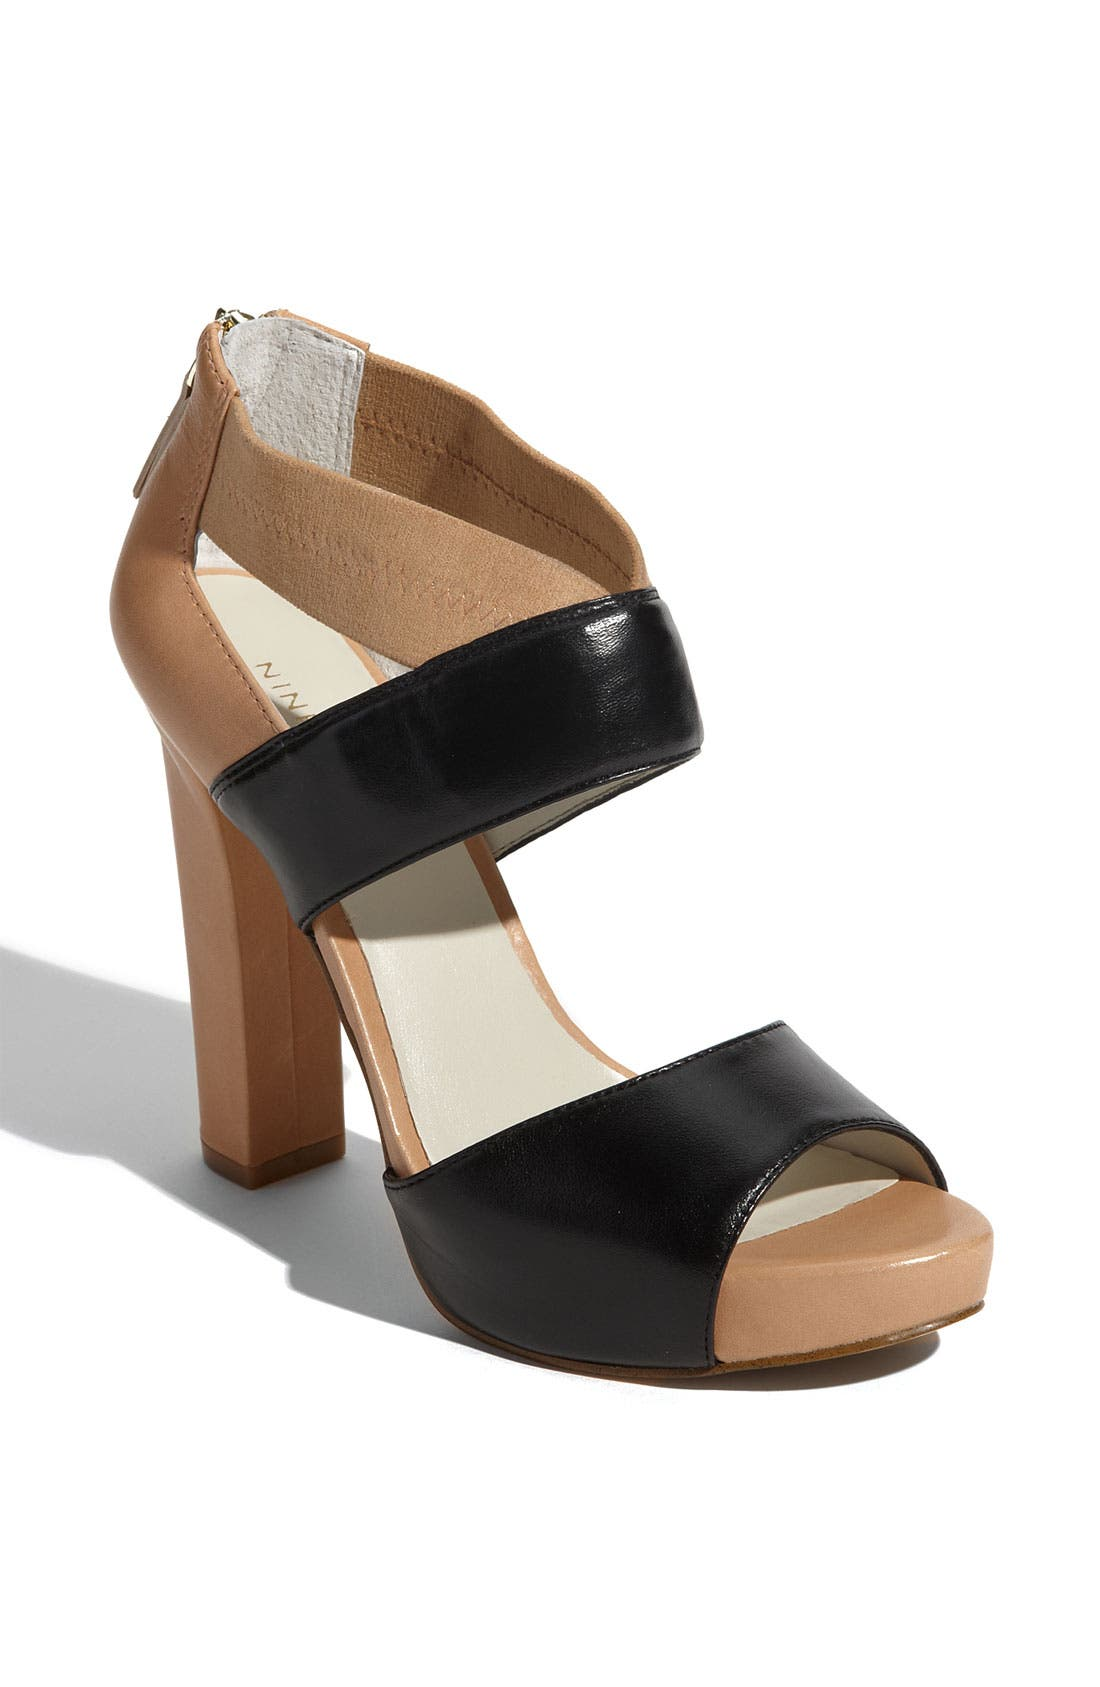 Alternate Image 1 Selected - Nine West 'Stylin' Sandal